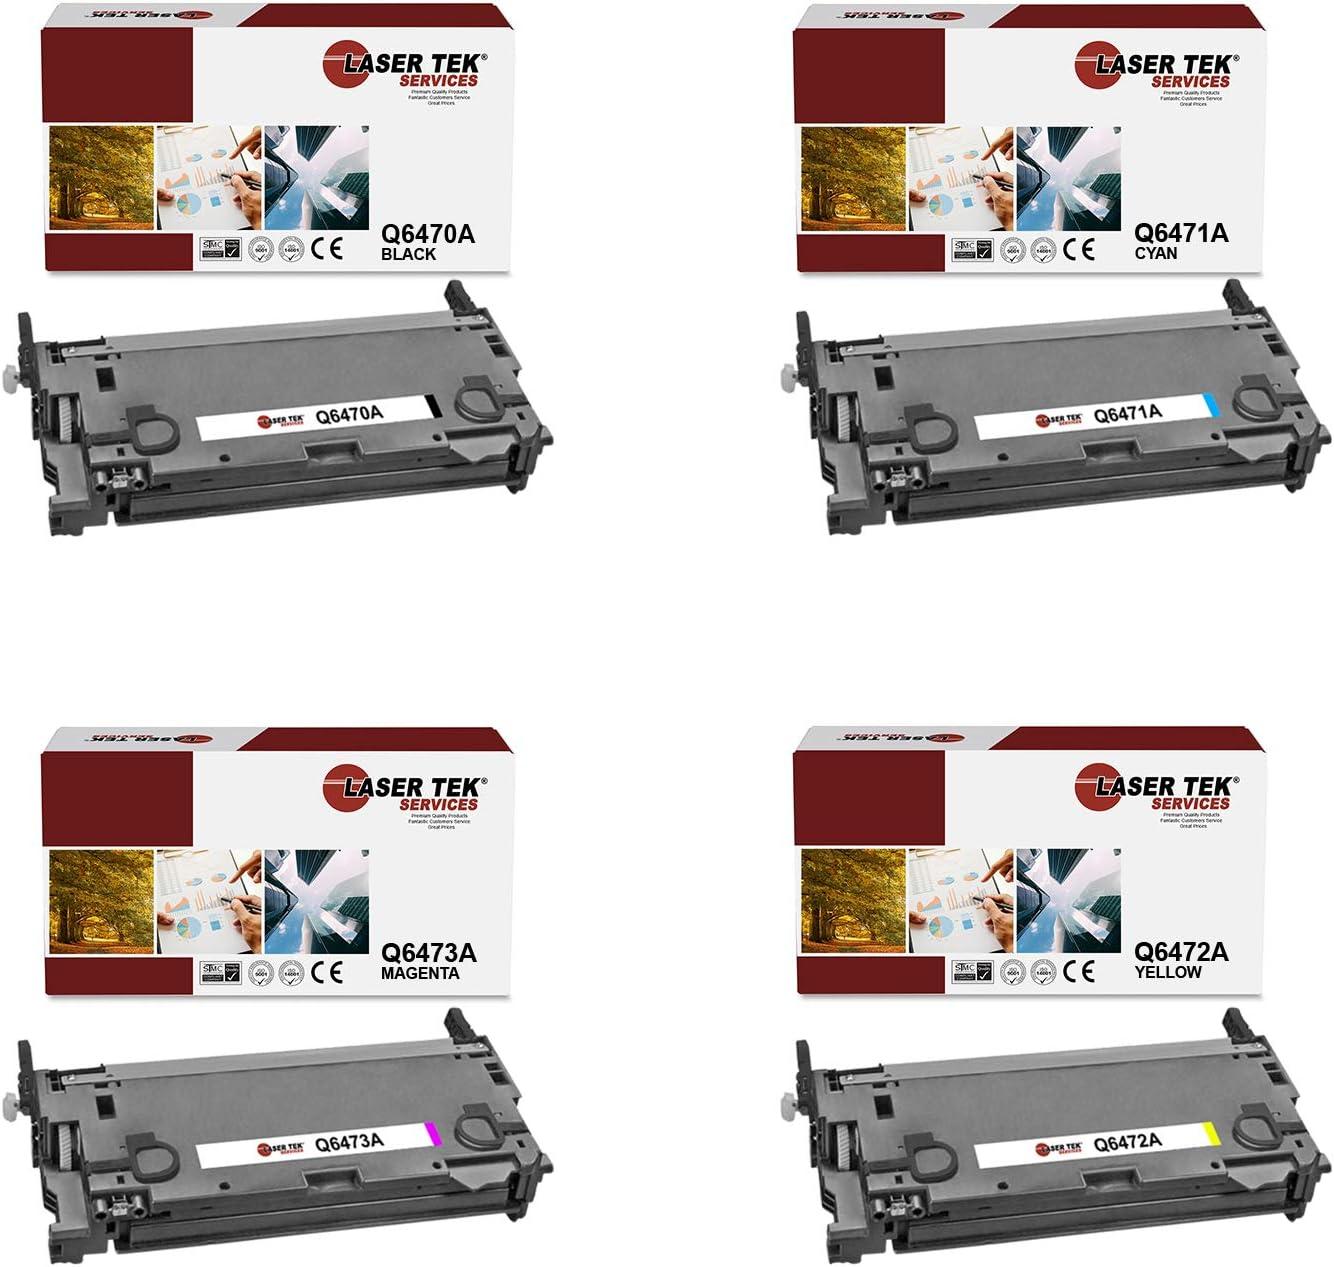 Cyan, 1-Pack Laser Tek Services Compatible Toner Cartridge ...